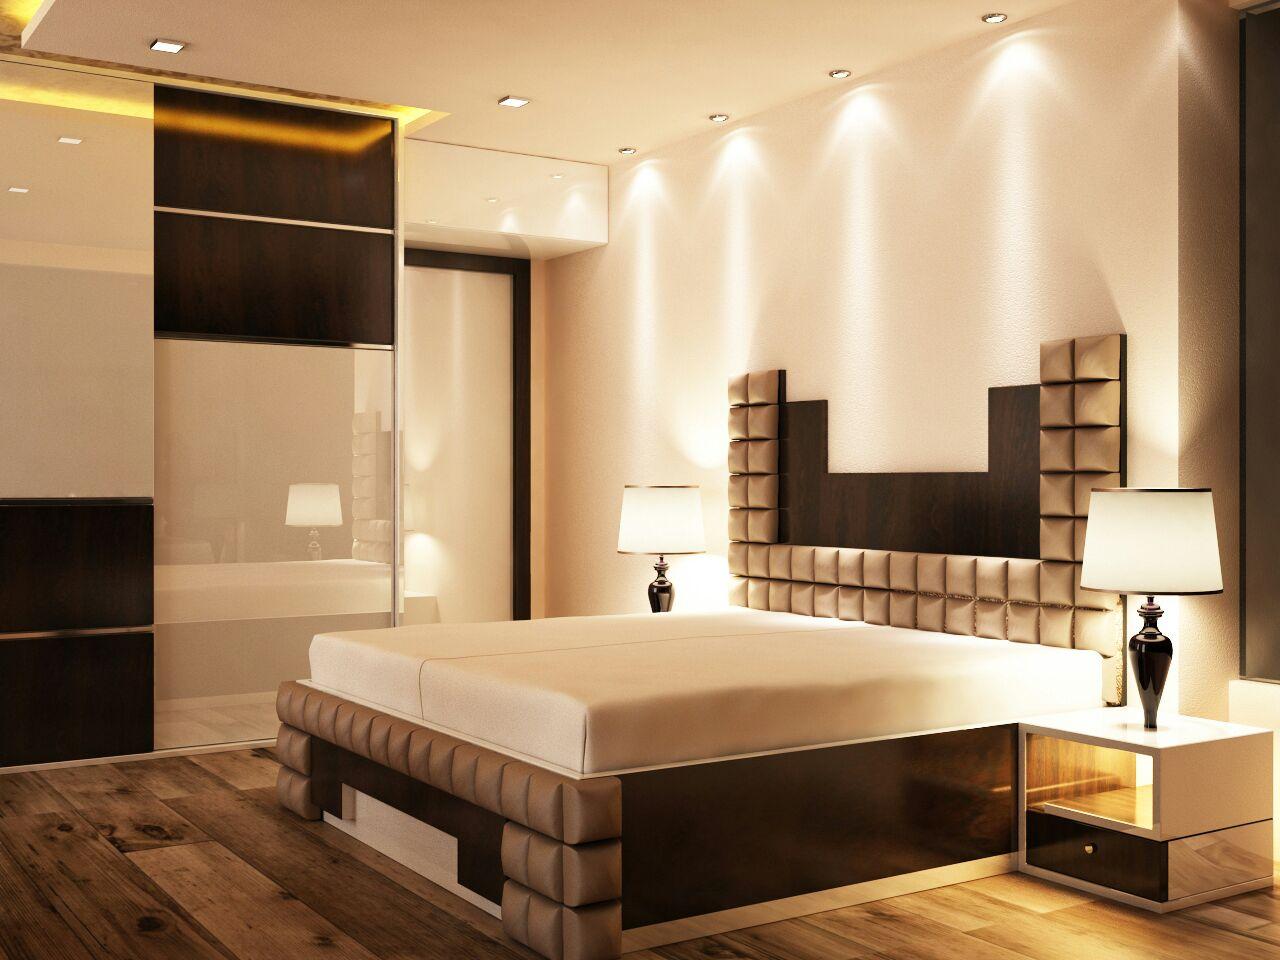 Brightly Light Bedroom by Elegant Interieurs Bedroom | Interior Design Photos & Ideas